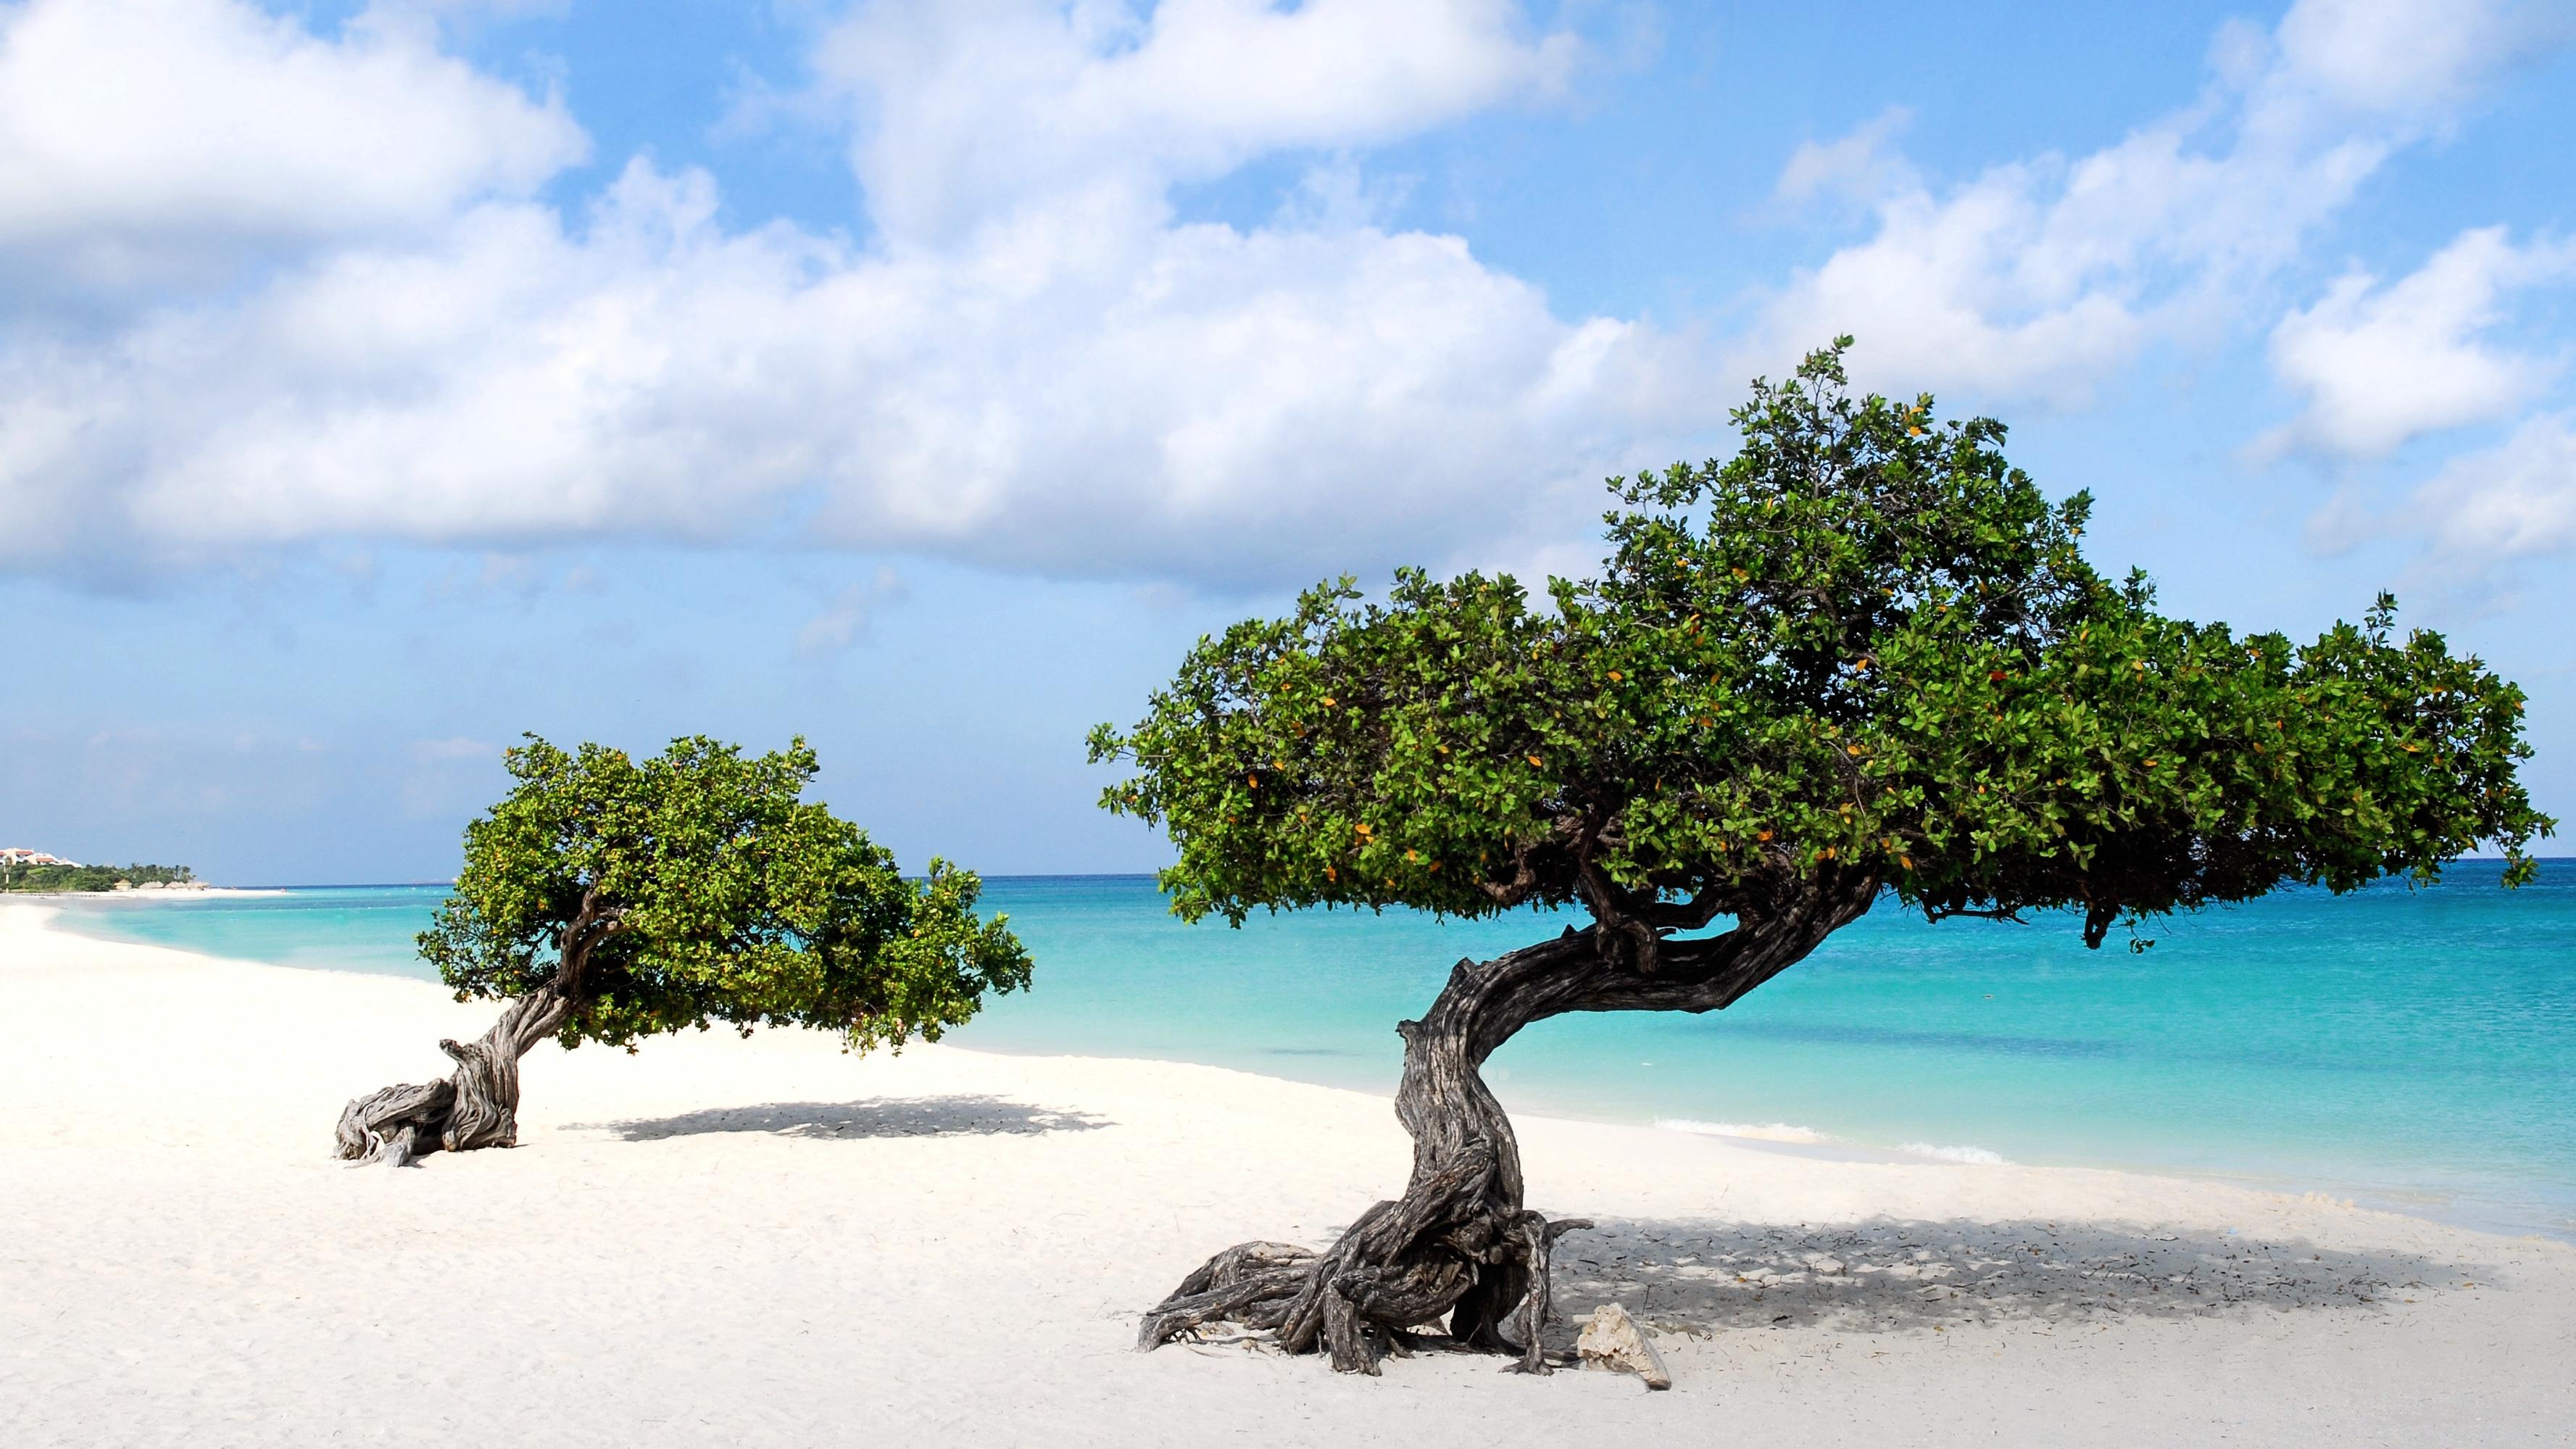 Beautiful wallpaper of Divi trees in Aruba island - Beach Wallpapers